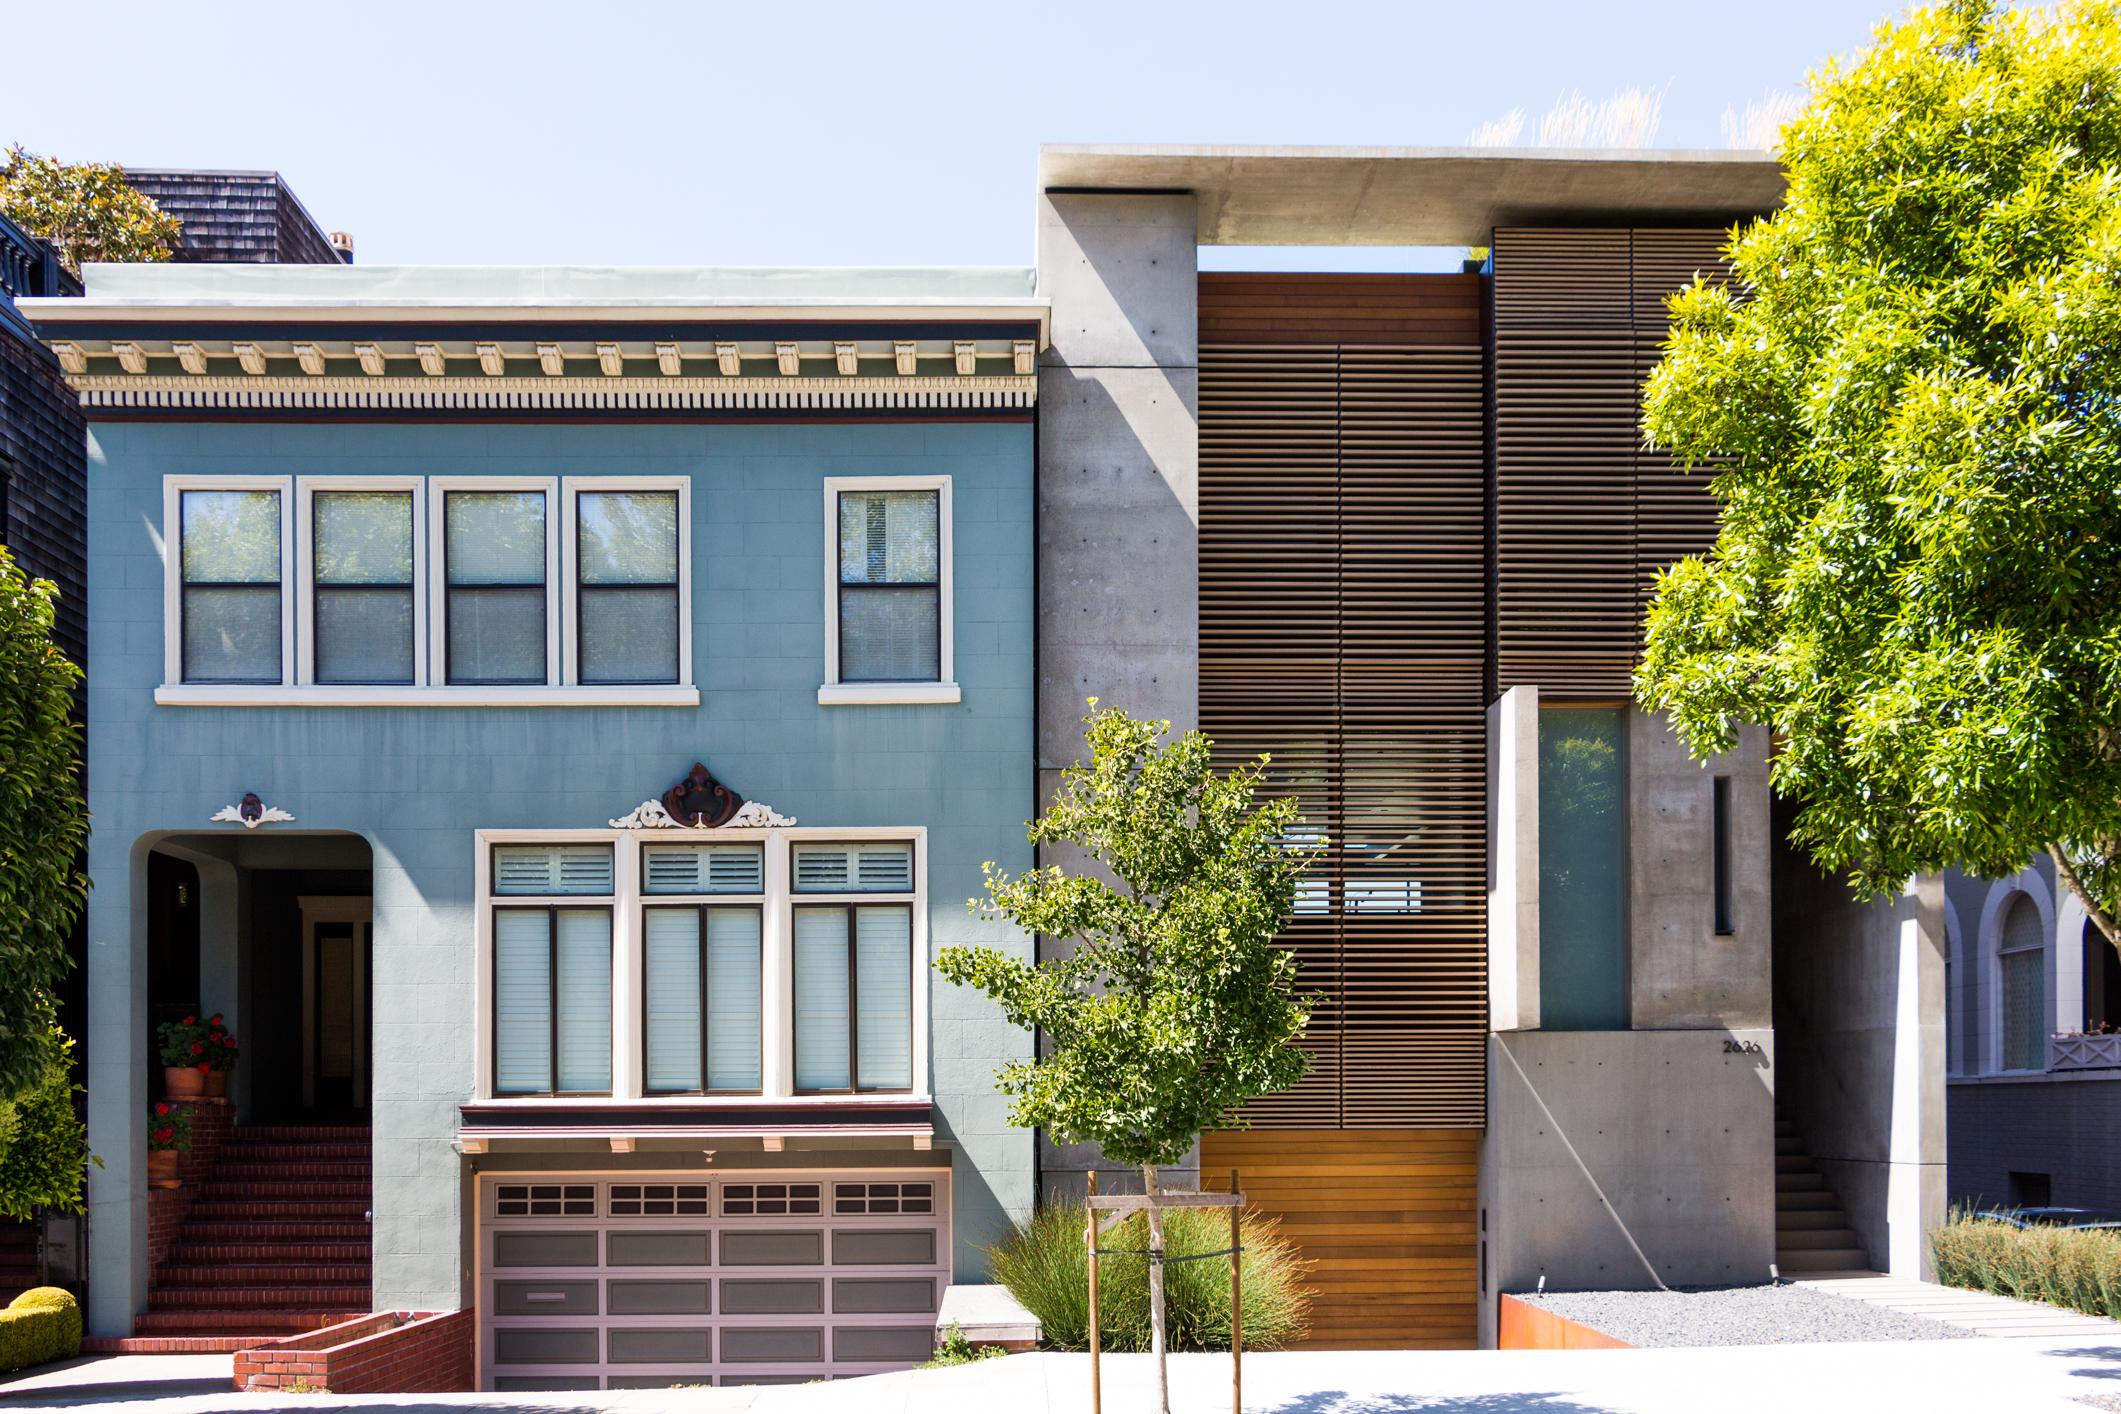 San Francisco Real Estate Predictions